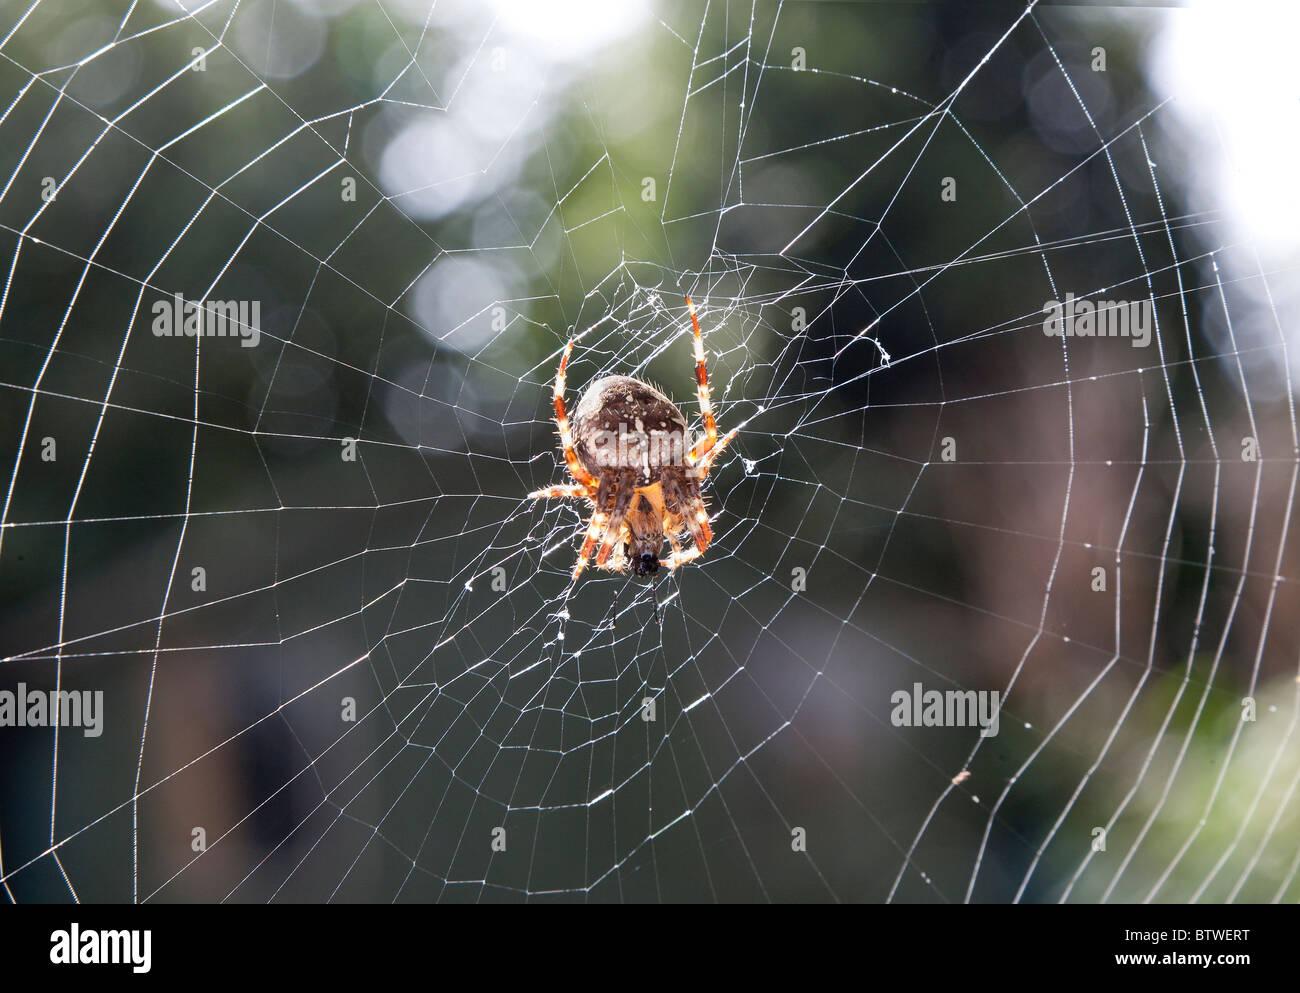 GARDEN SPIDER FEEDING ON FLY ON WEB - Stock Image